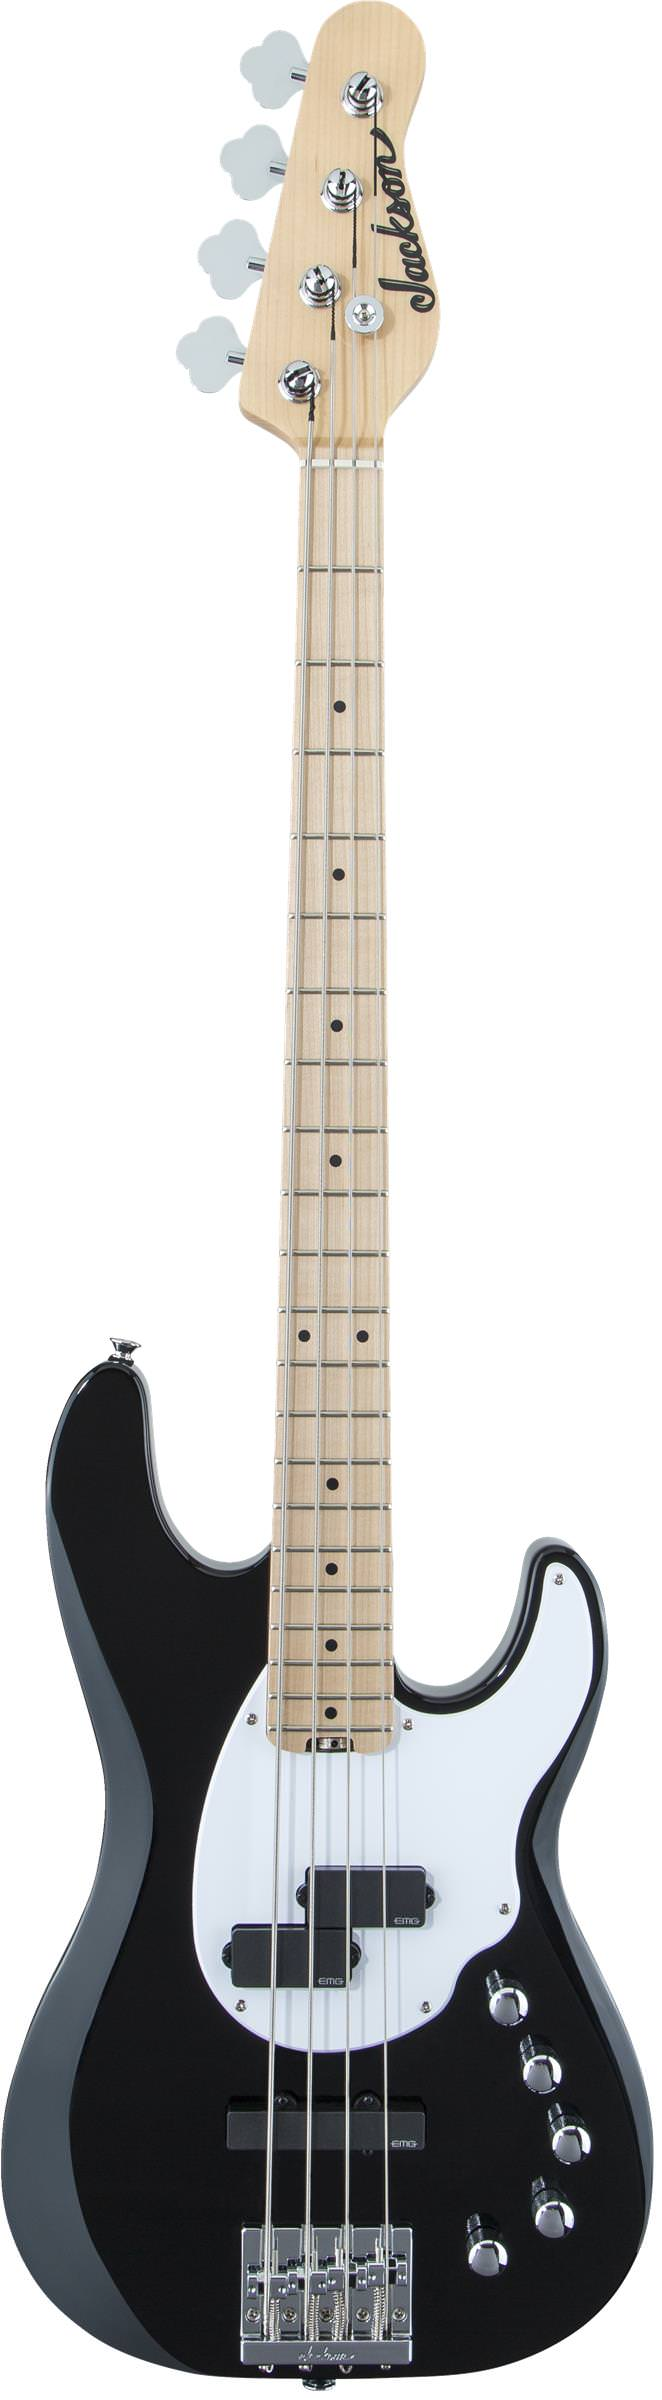 Бас-гитара Jackson Dave Ellefson CBX-M IV BLK